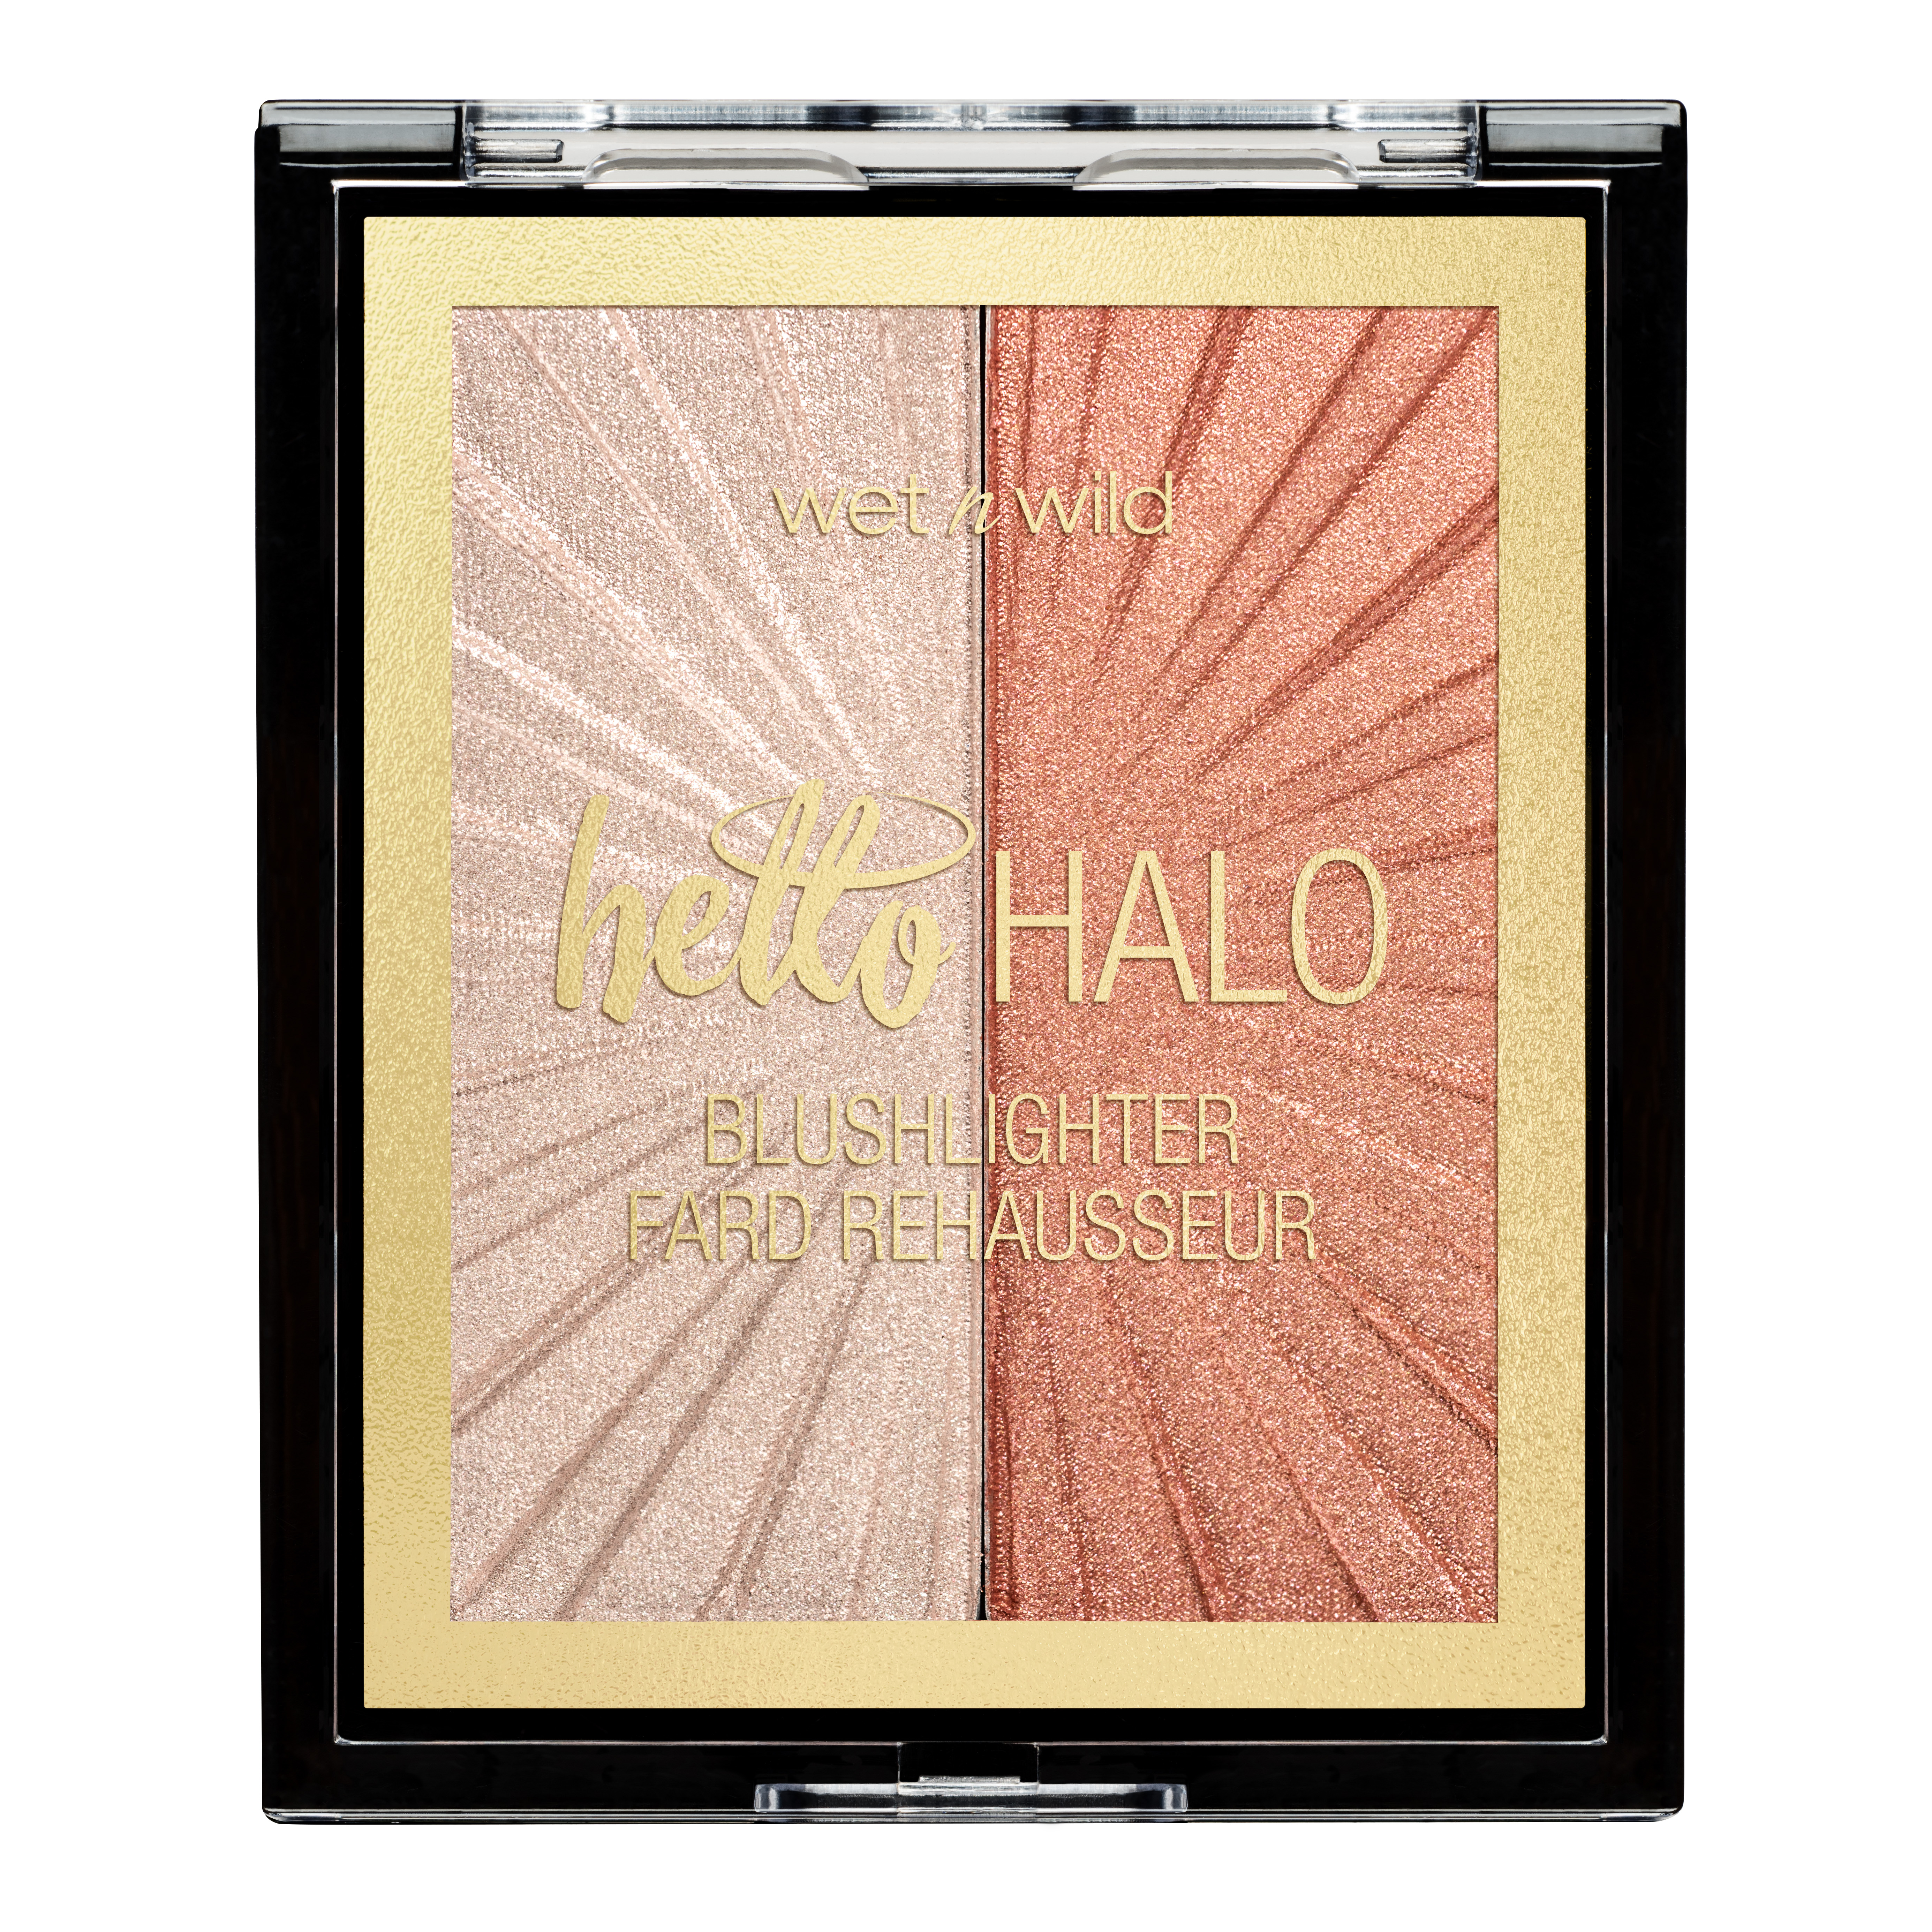 Wet n Wild MegaGlo Hello Halo Blushlighter